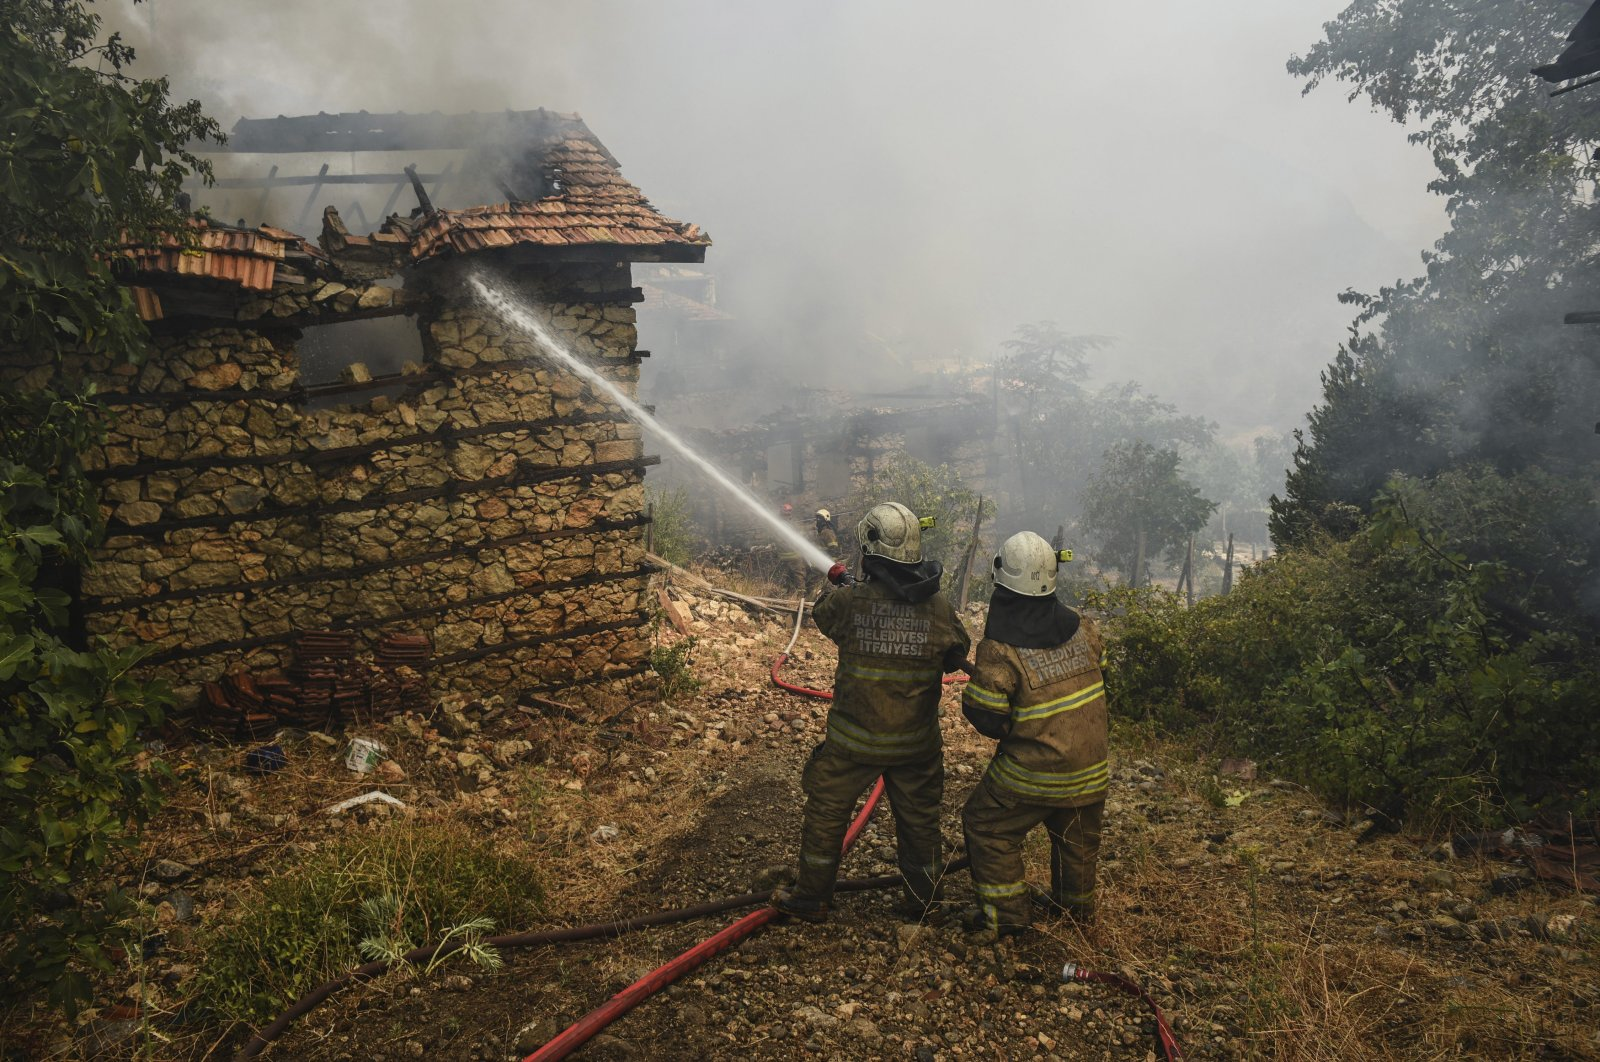 Firefighters water to stop a fire in the fire-devastating Sirtkoy village, near Manavgat, Antalya, Turkey, Sunday, Aug. 1, 2021. (AP Photo)